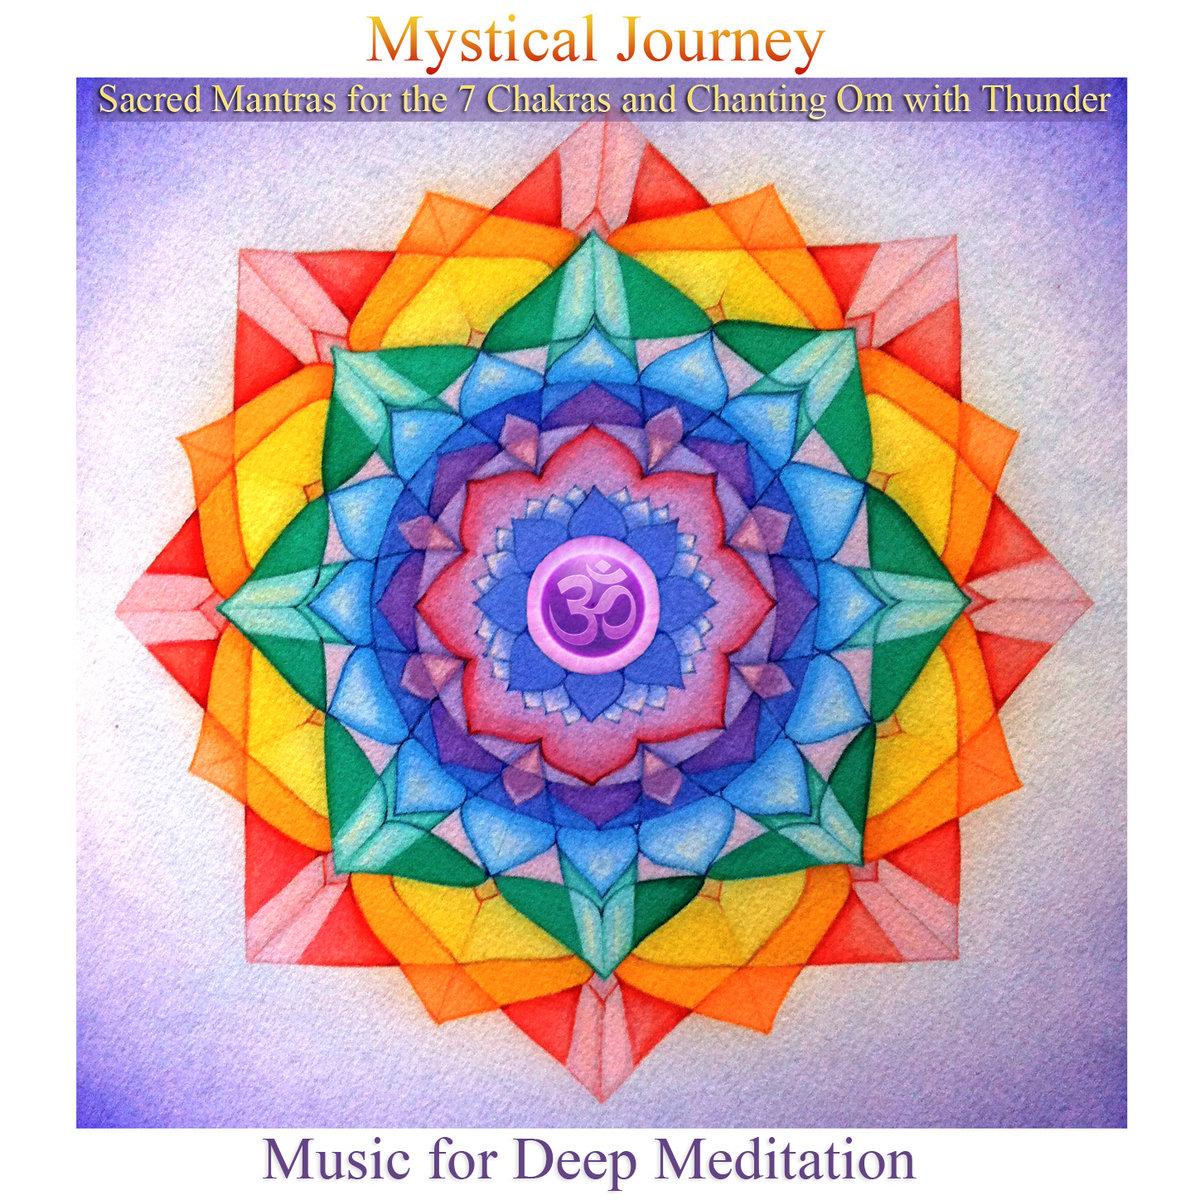 Light - Divine Manifestation, Bija Mantras for the Ajna